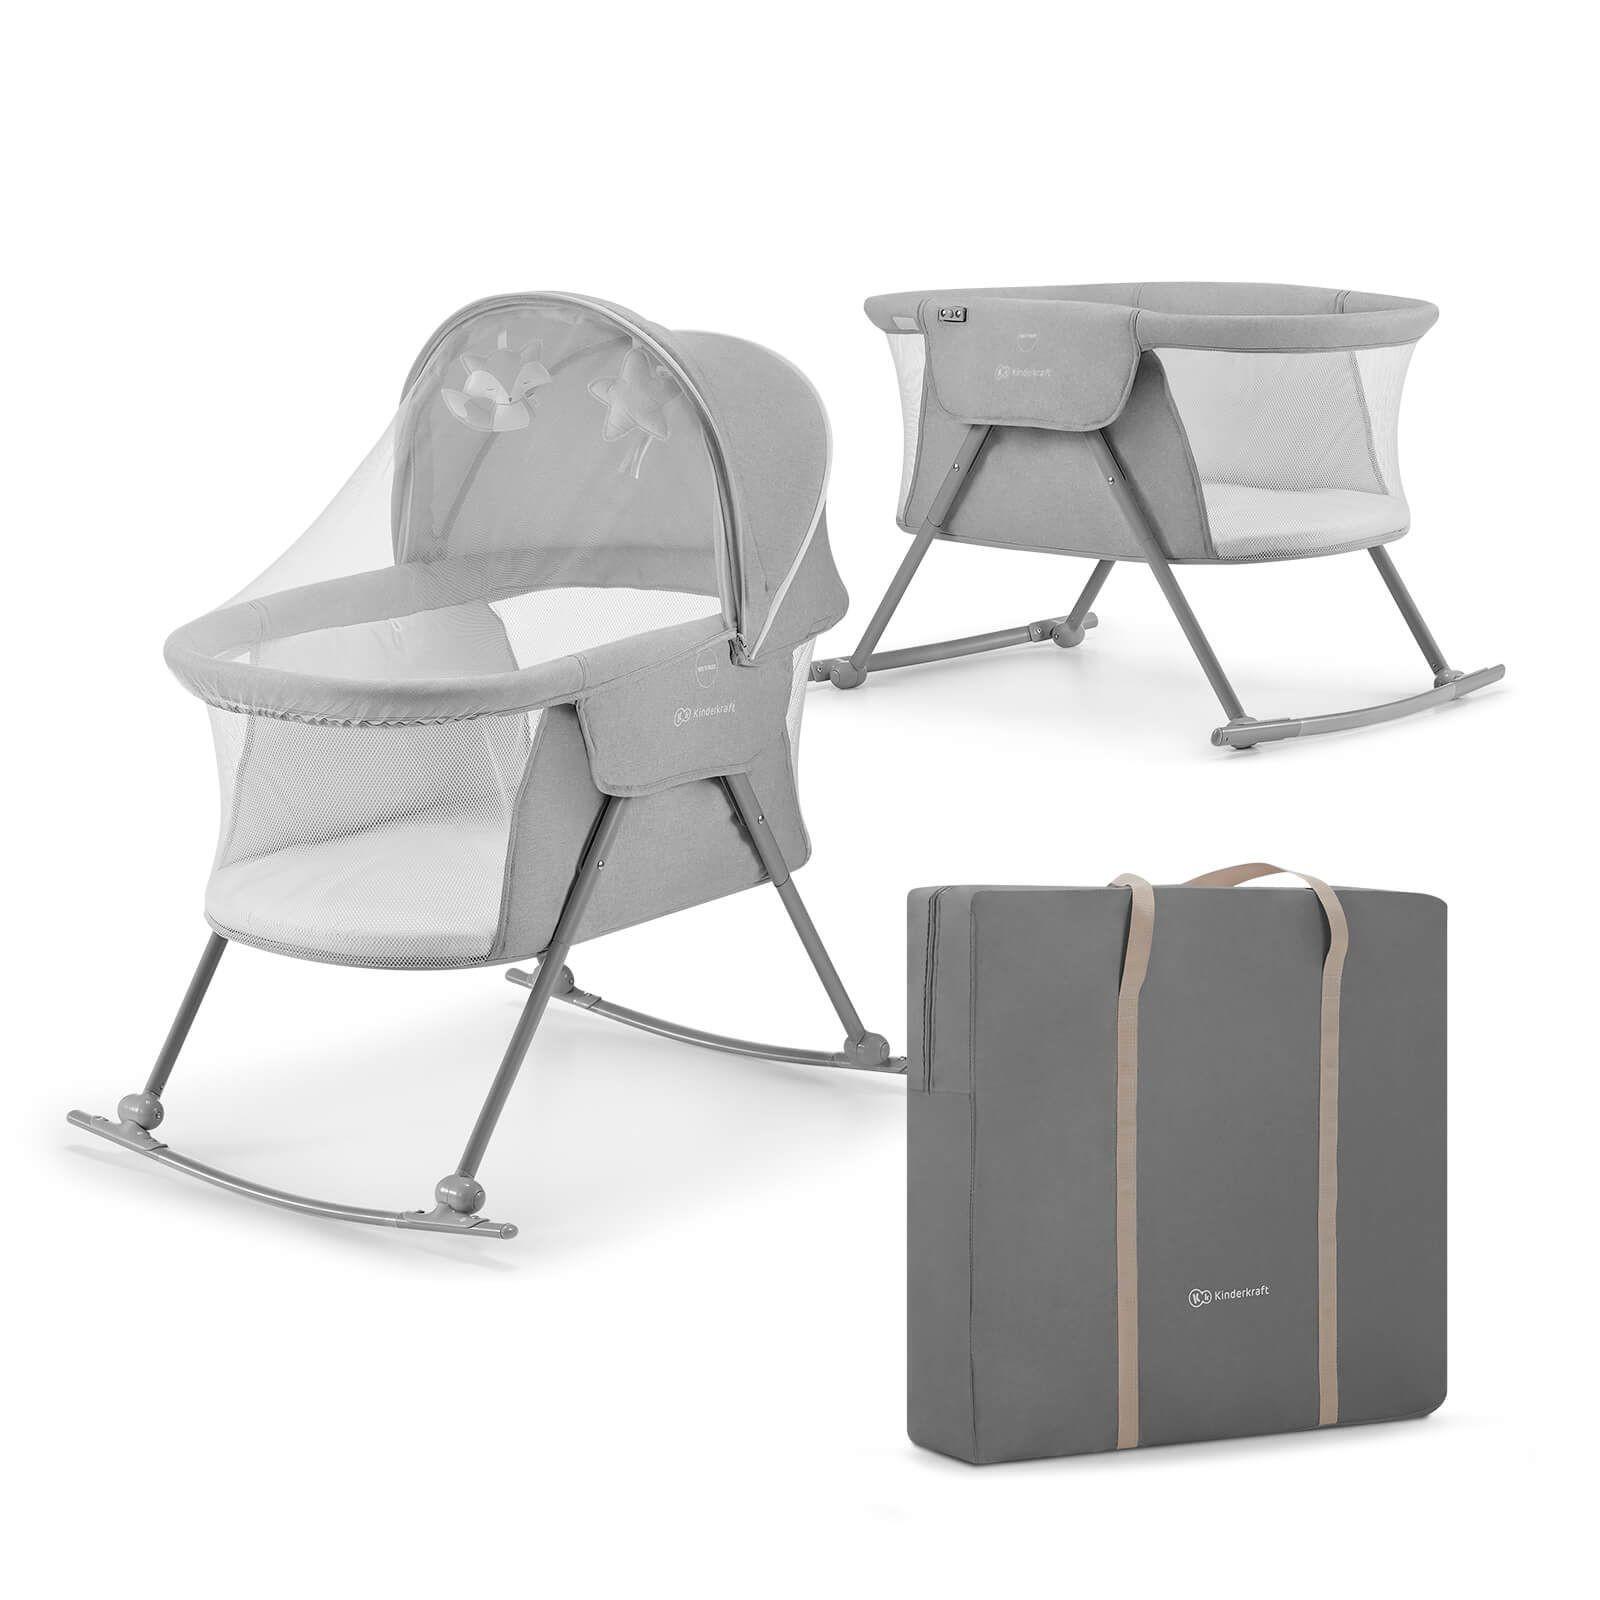 Lit bébé Lovi Kinderkraft 3 en 1 Grey